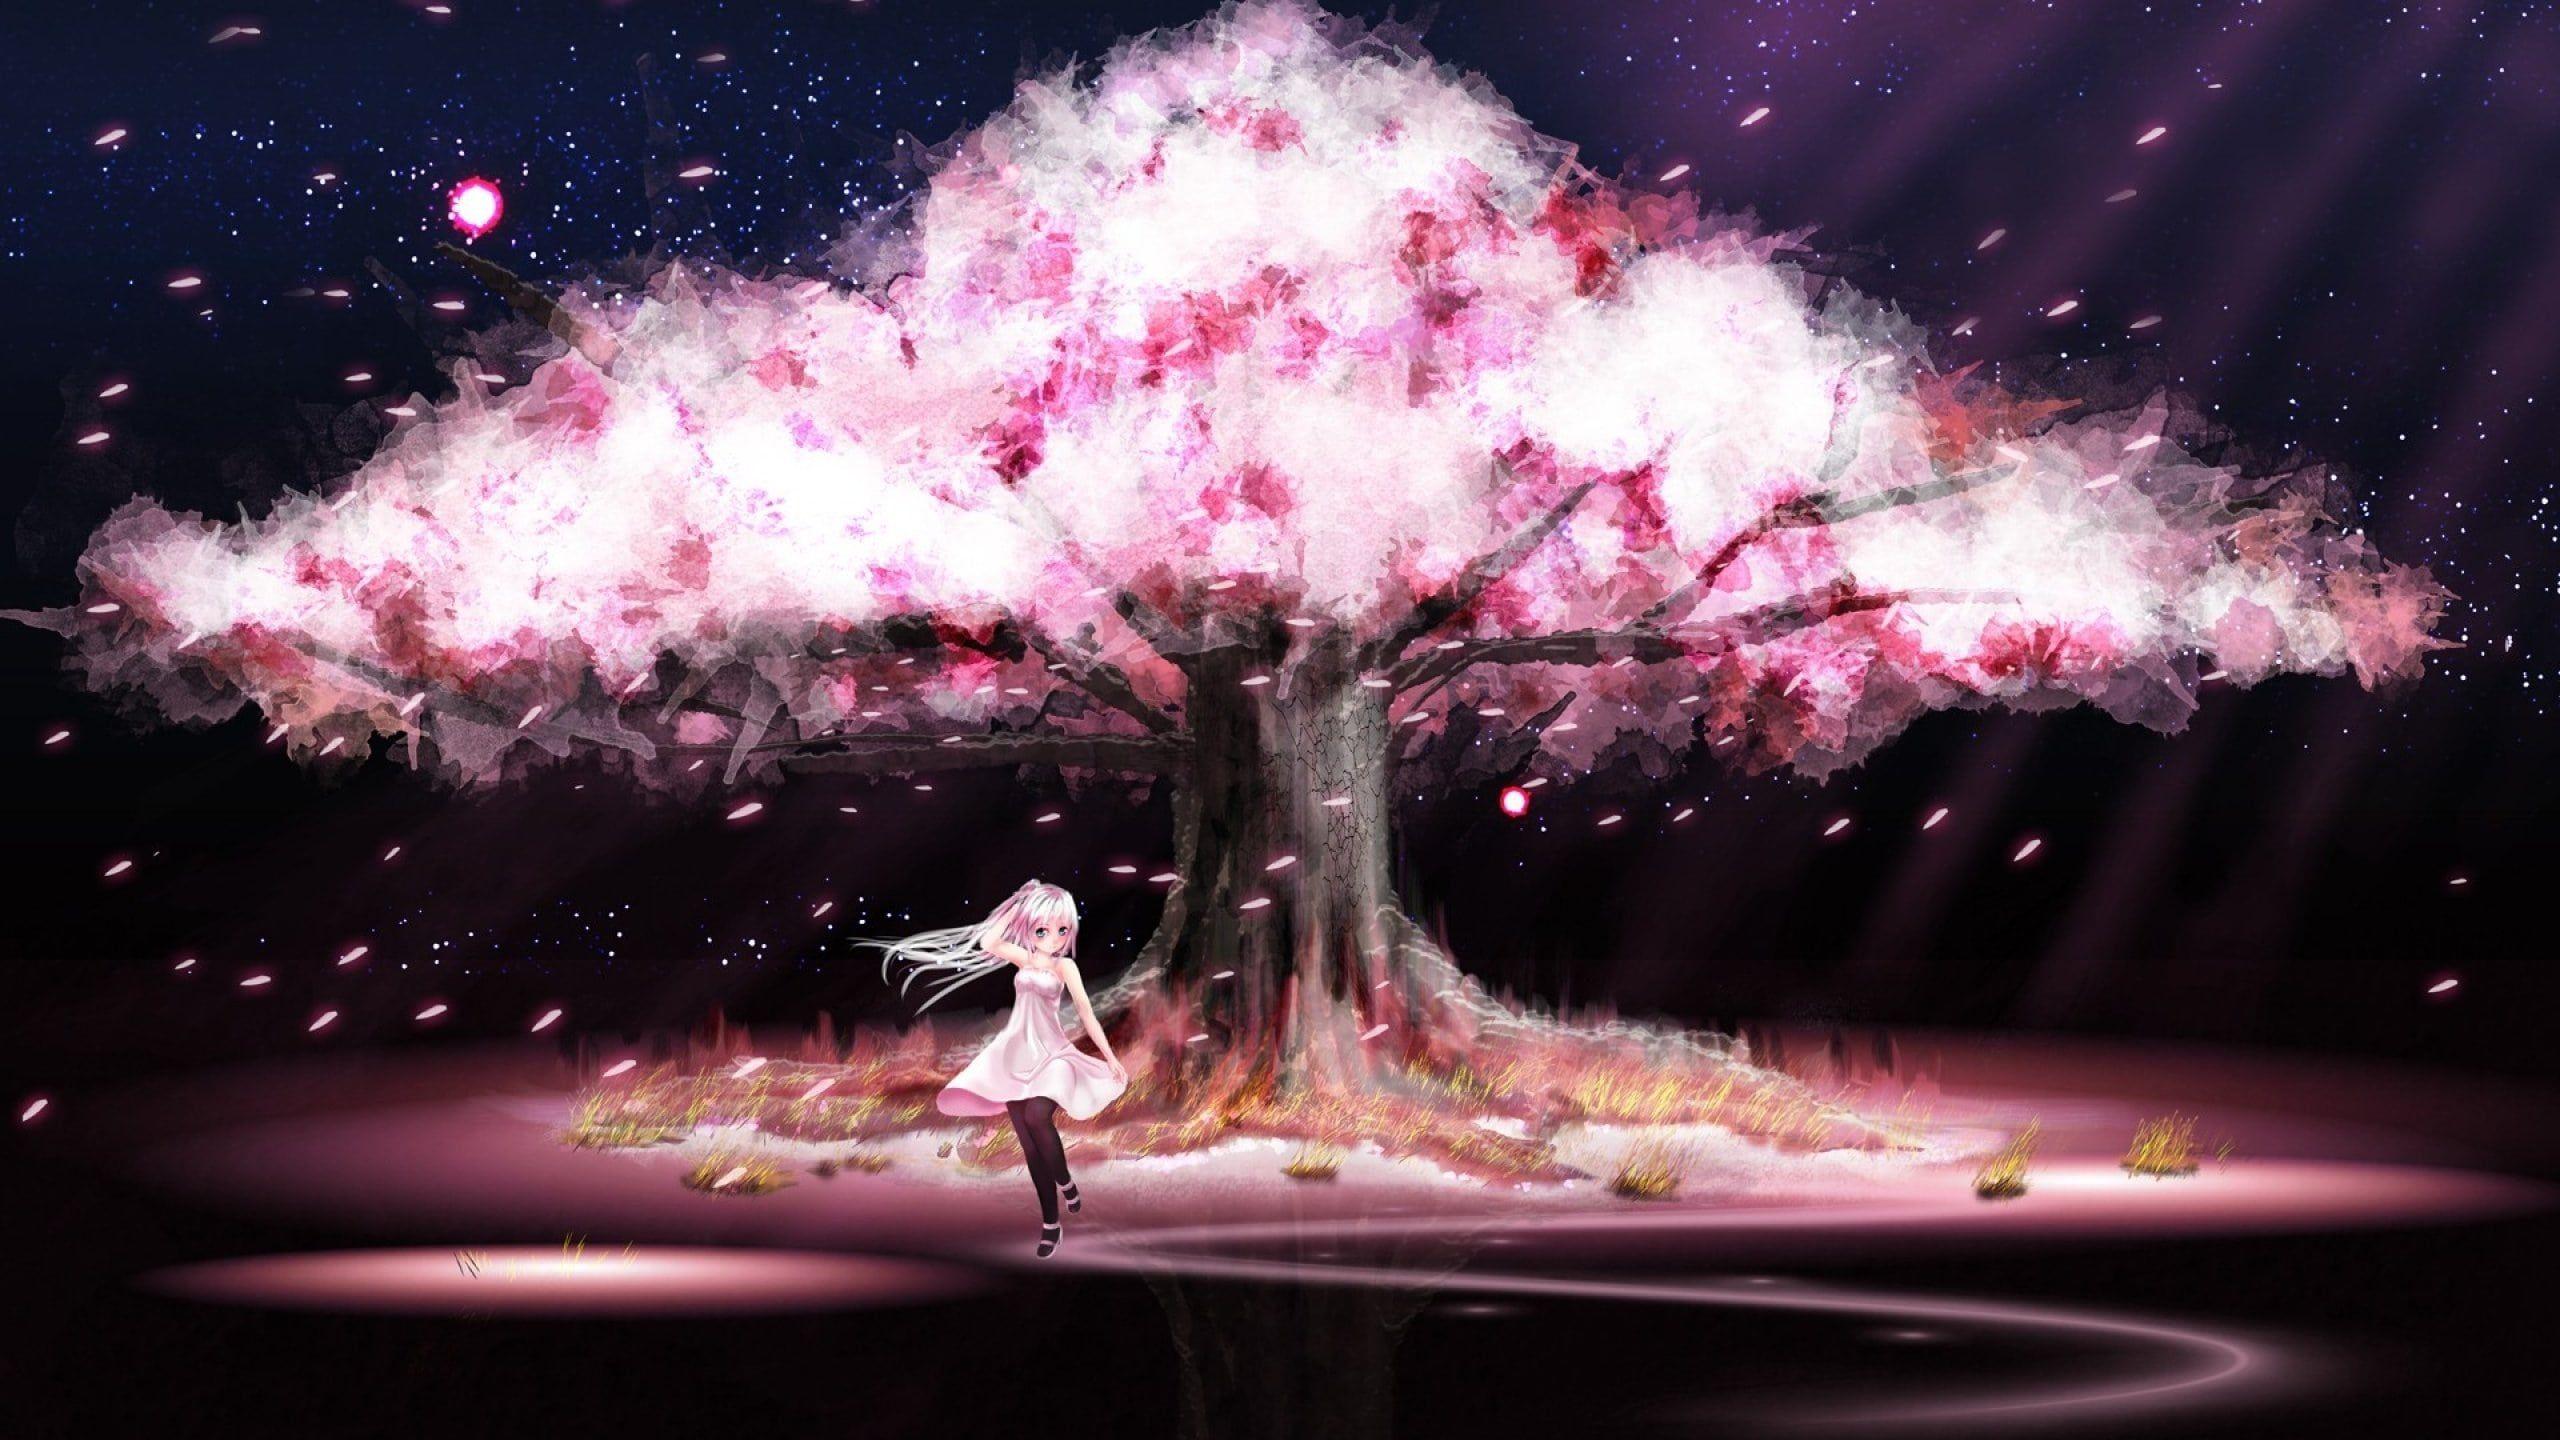 Anime Sakura Blossoms Cherry Tree Anime Blossoms Cherry Sakura Tree Anime Sakura Blossoms Ch Cherry Blossom Wallpaper Anime Cherry Blossom Anime Scenery